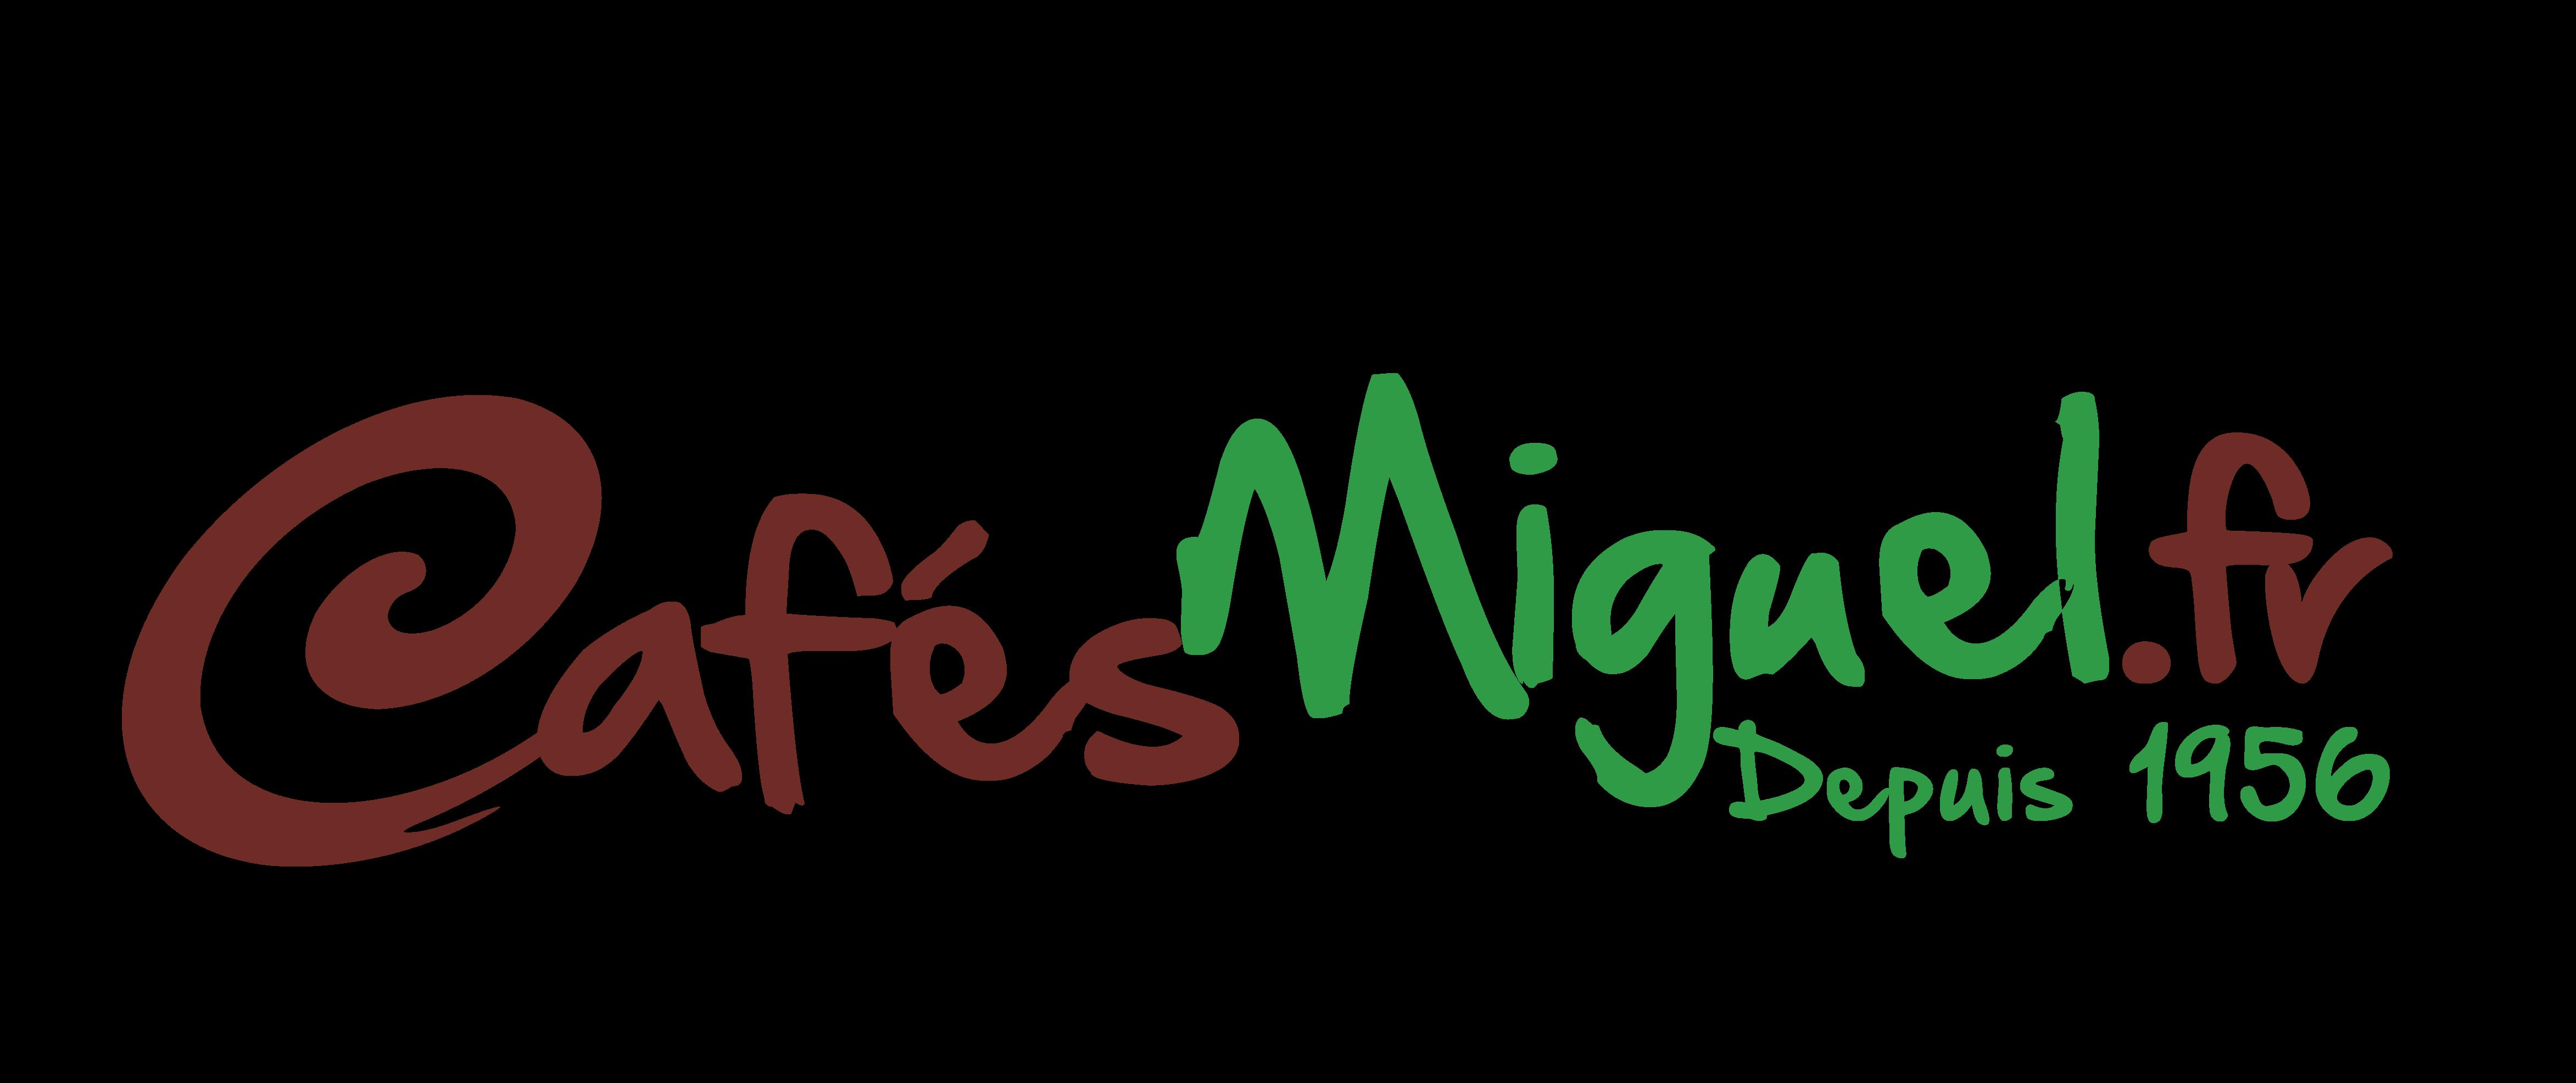 Cafés Miguel